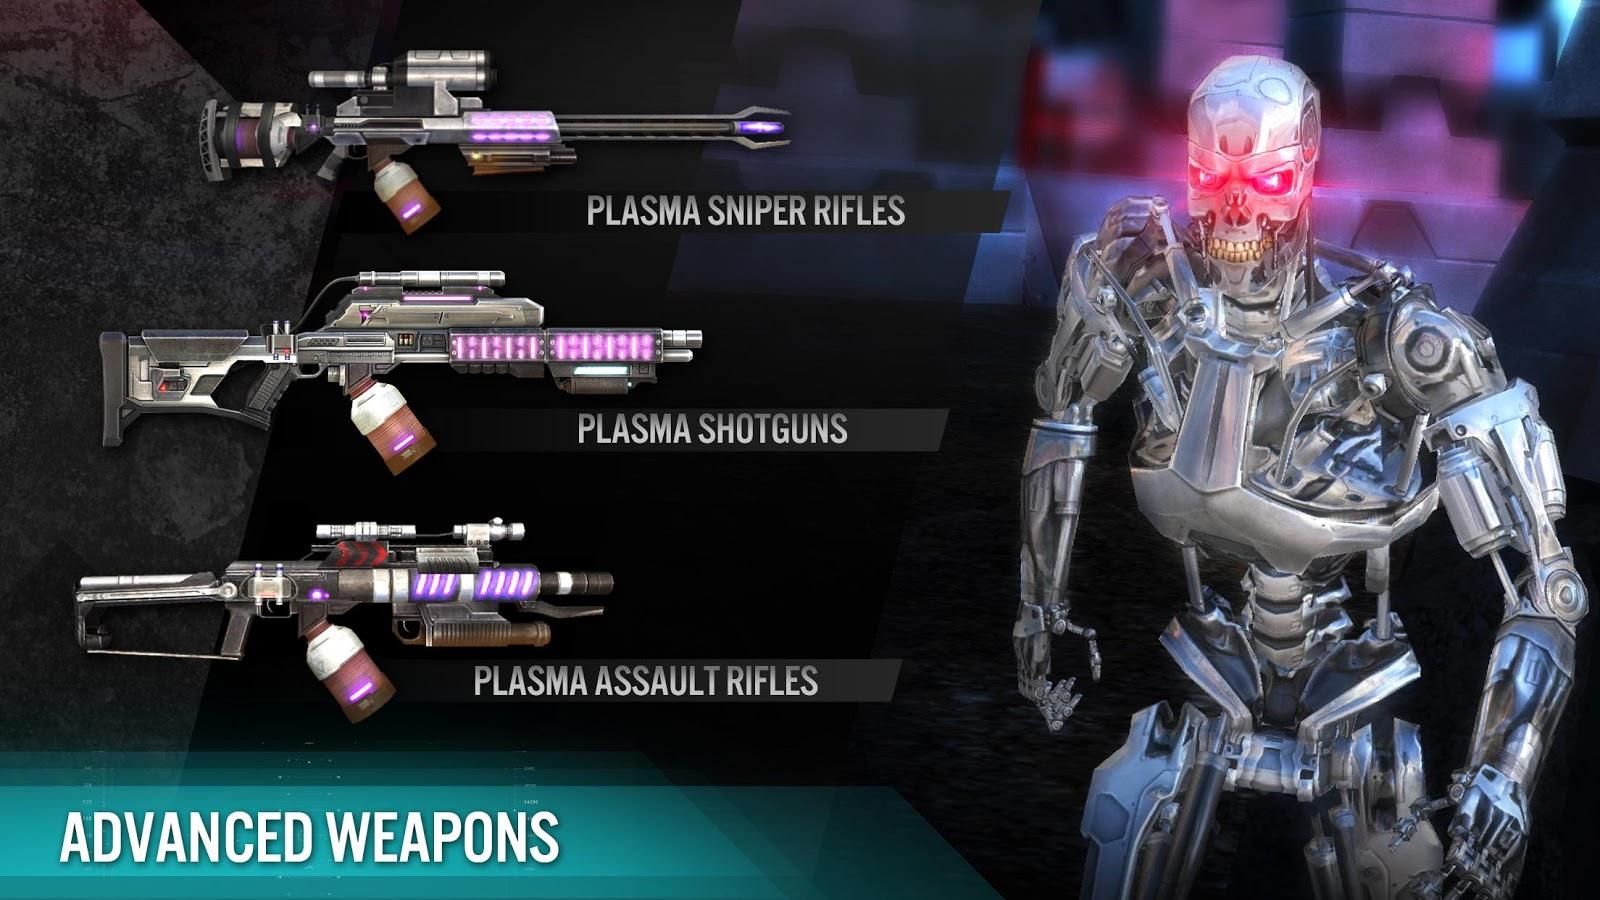 Terminator Genisys Revolution Galaxy S6 Gameplay Part 2